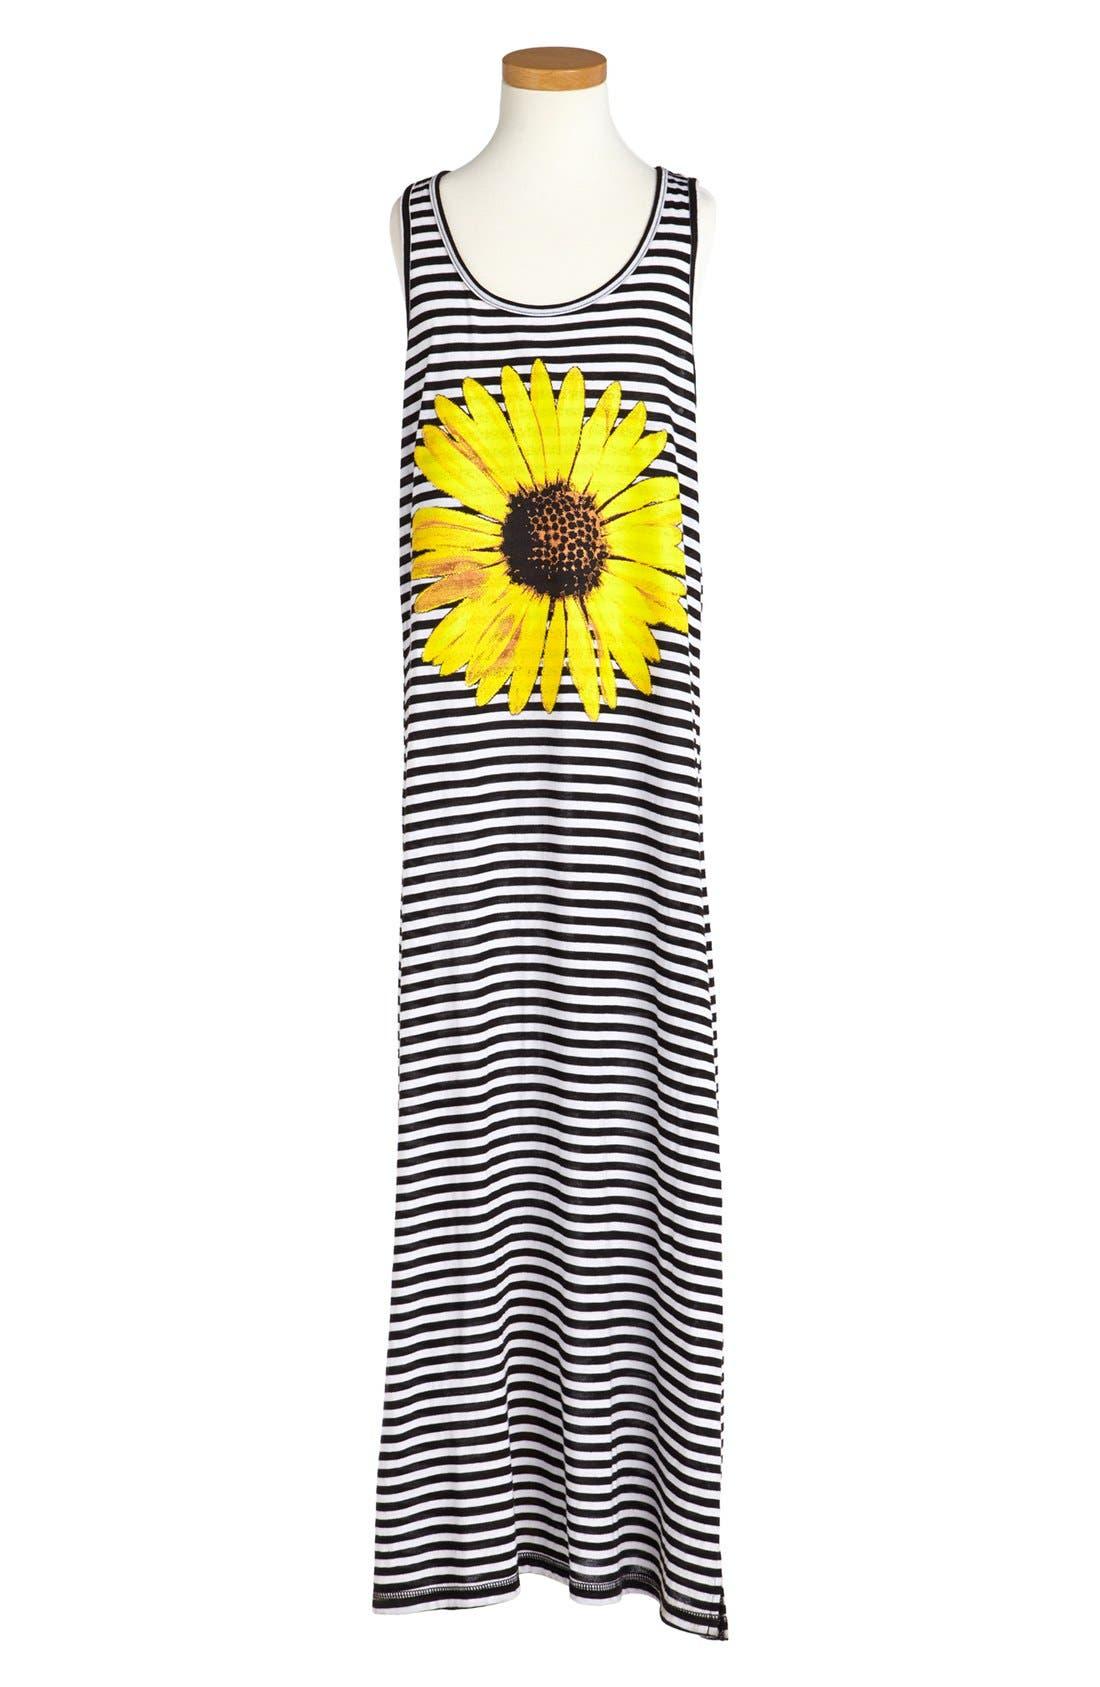 Alternate Image 1 Selected - Little Pretties Stripe Sunflower Print Maxi Dress (Big Girls)